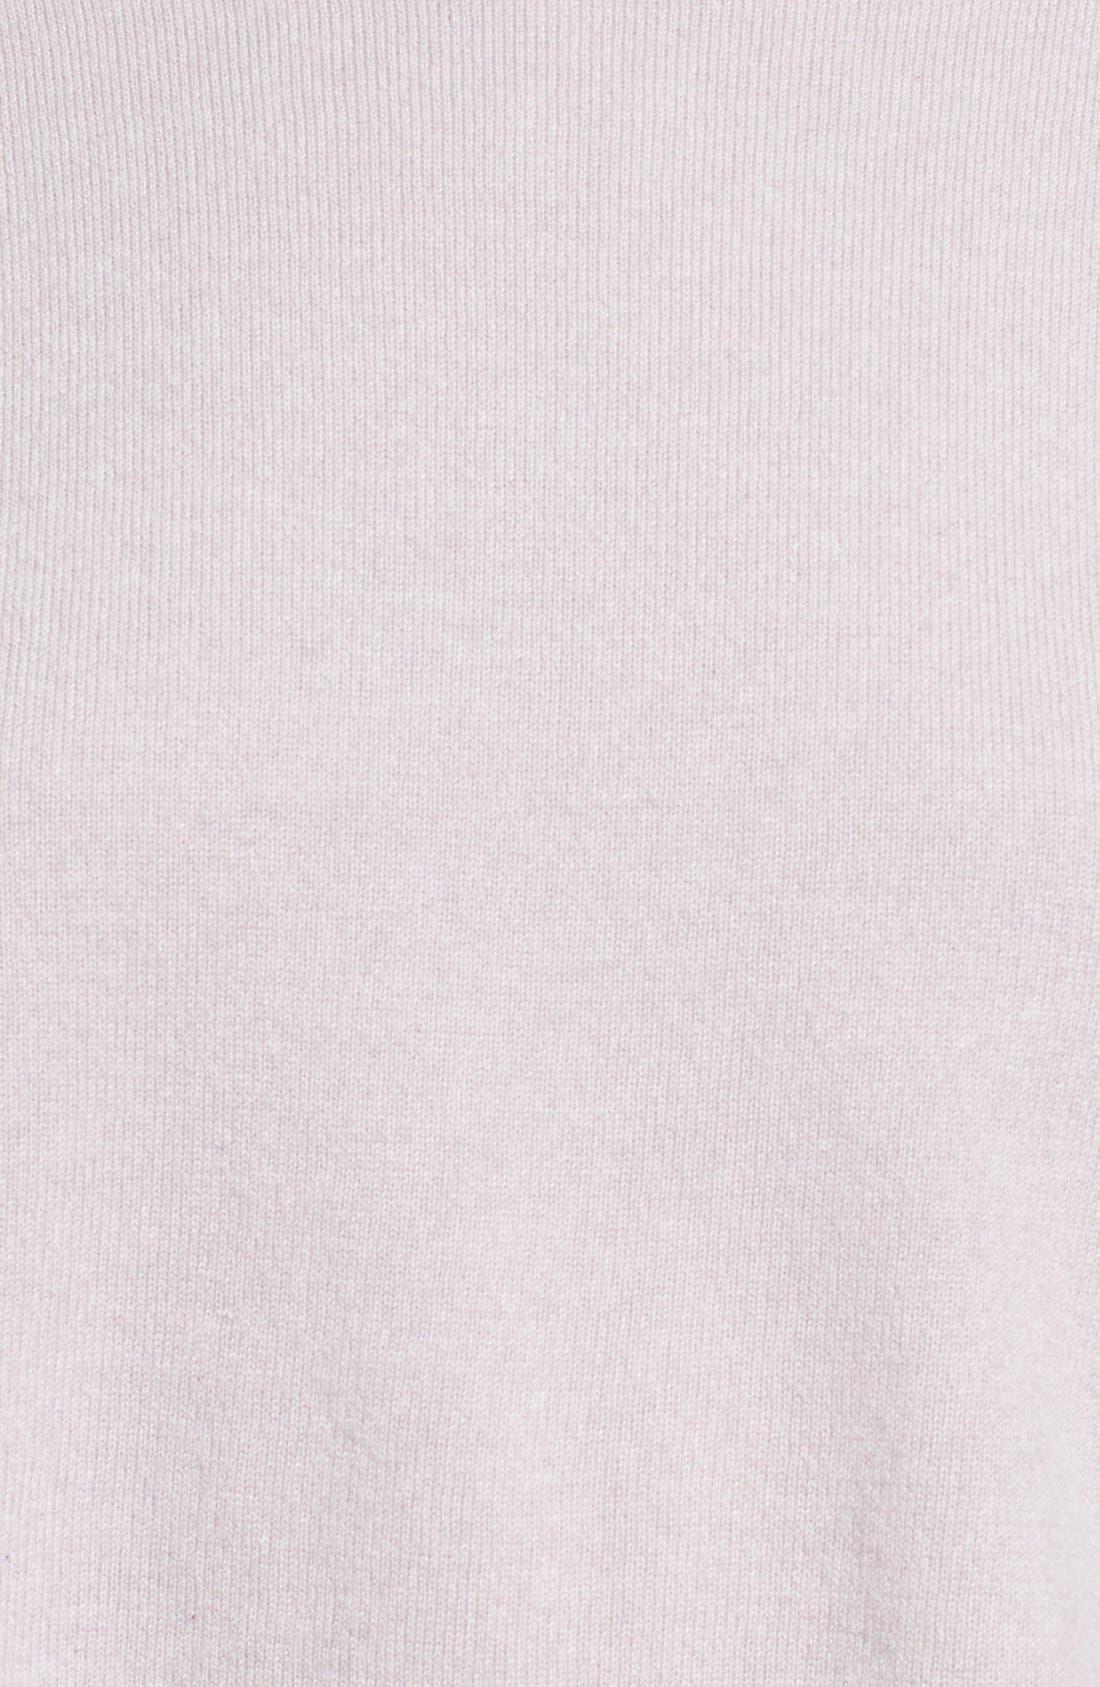 Alternate Image 3  - Fabiana Filippi Contrast Hem Cashmere & Stretch Silk Top